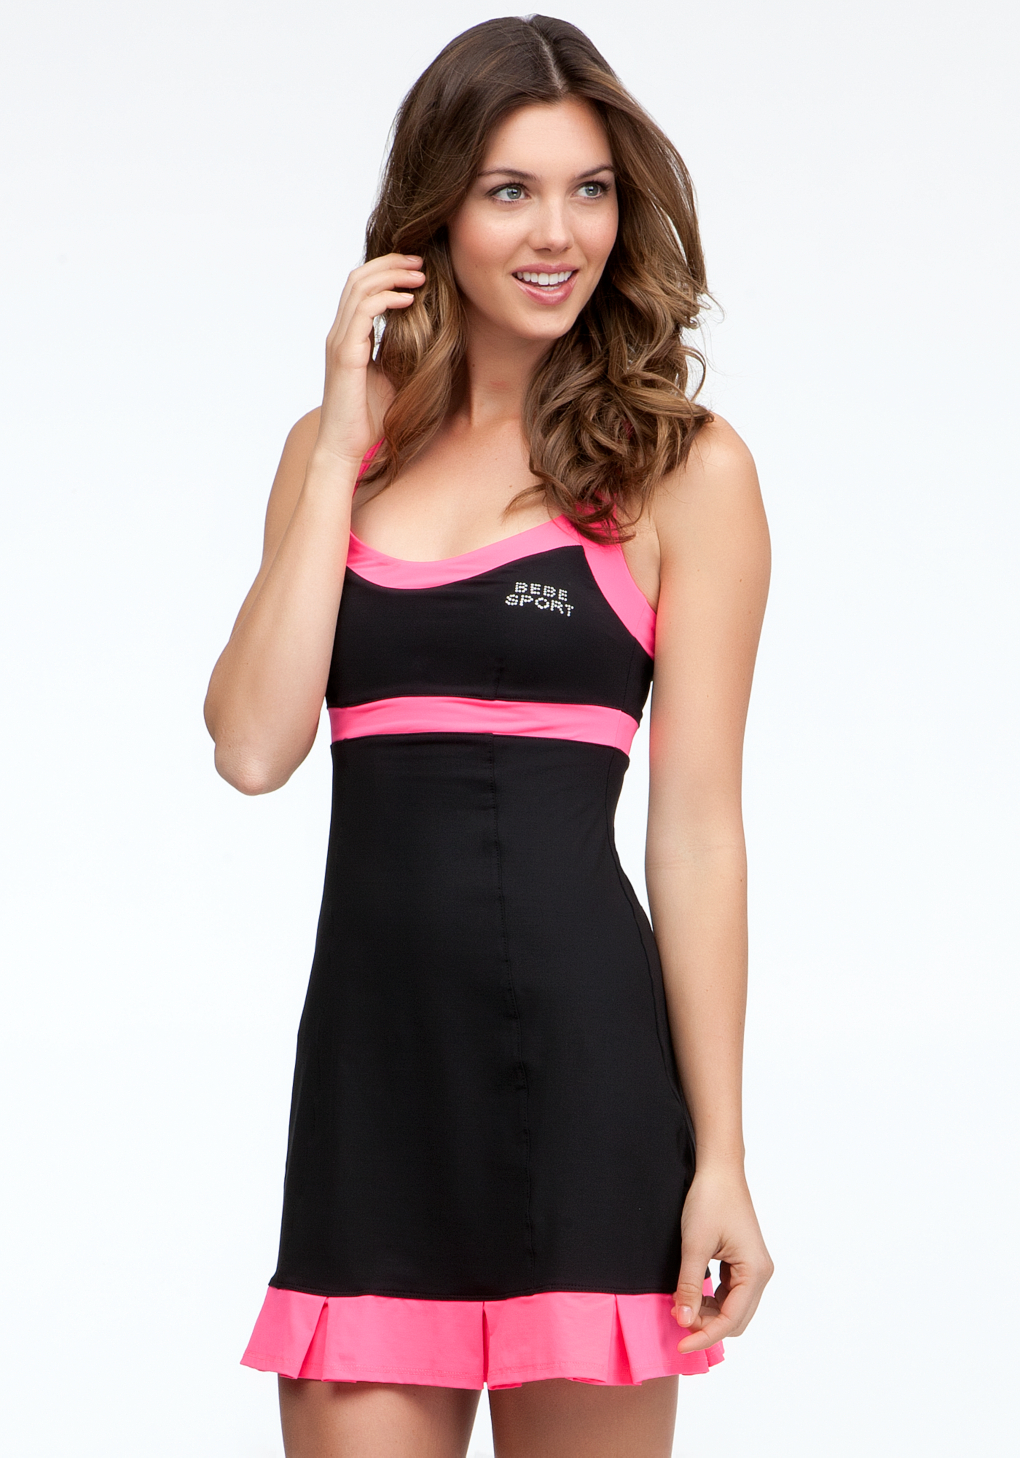 Tennis clothing online ireland